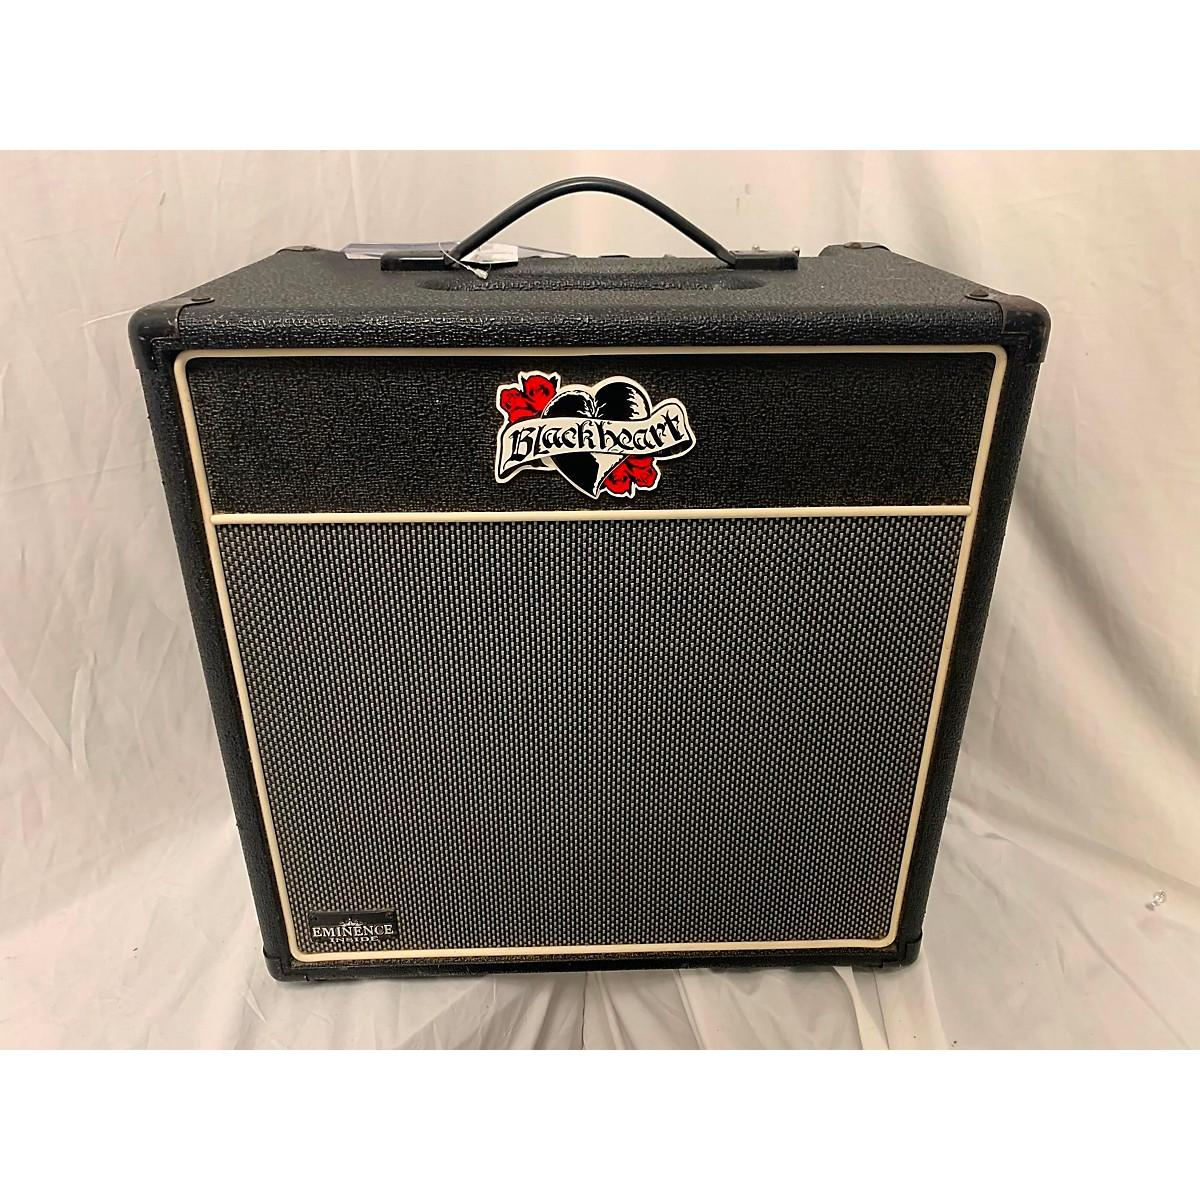 Blackheart BH15-112 Handsome Devil Series 15W 1x12 Tube Guitar Combo Amp